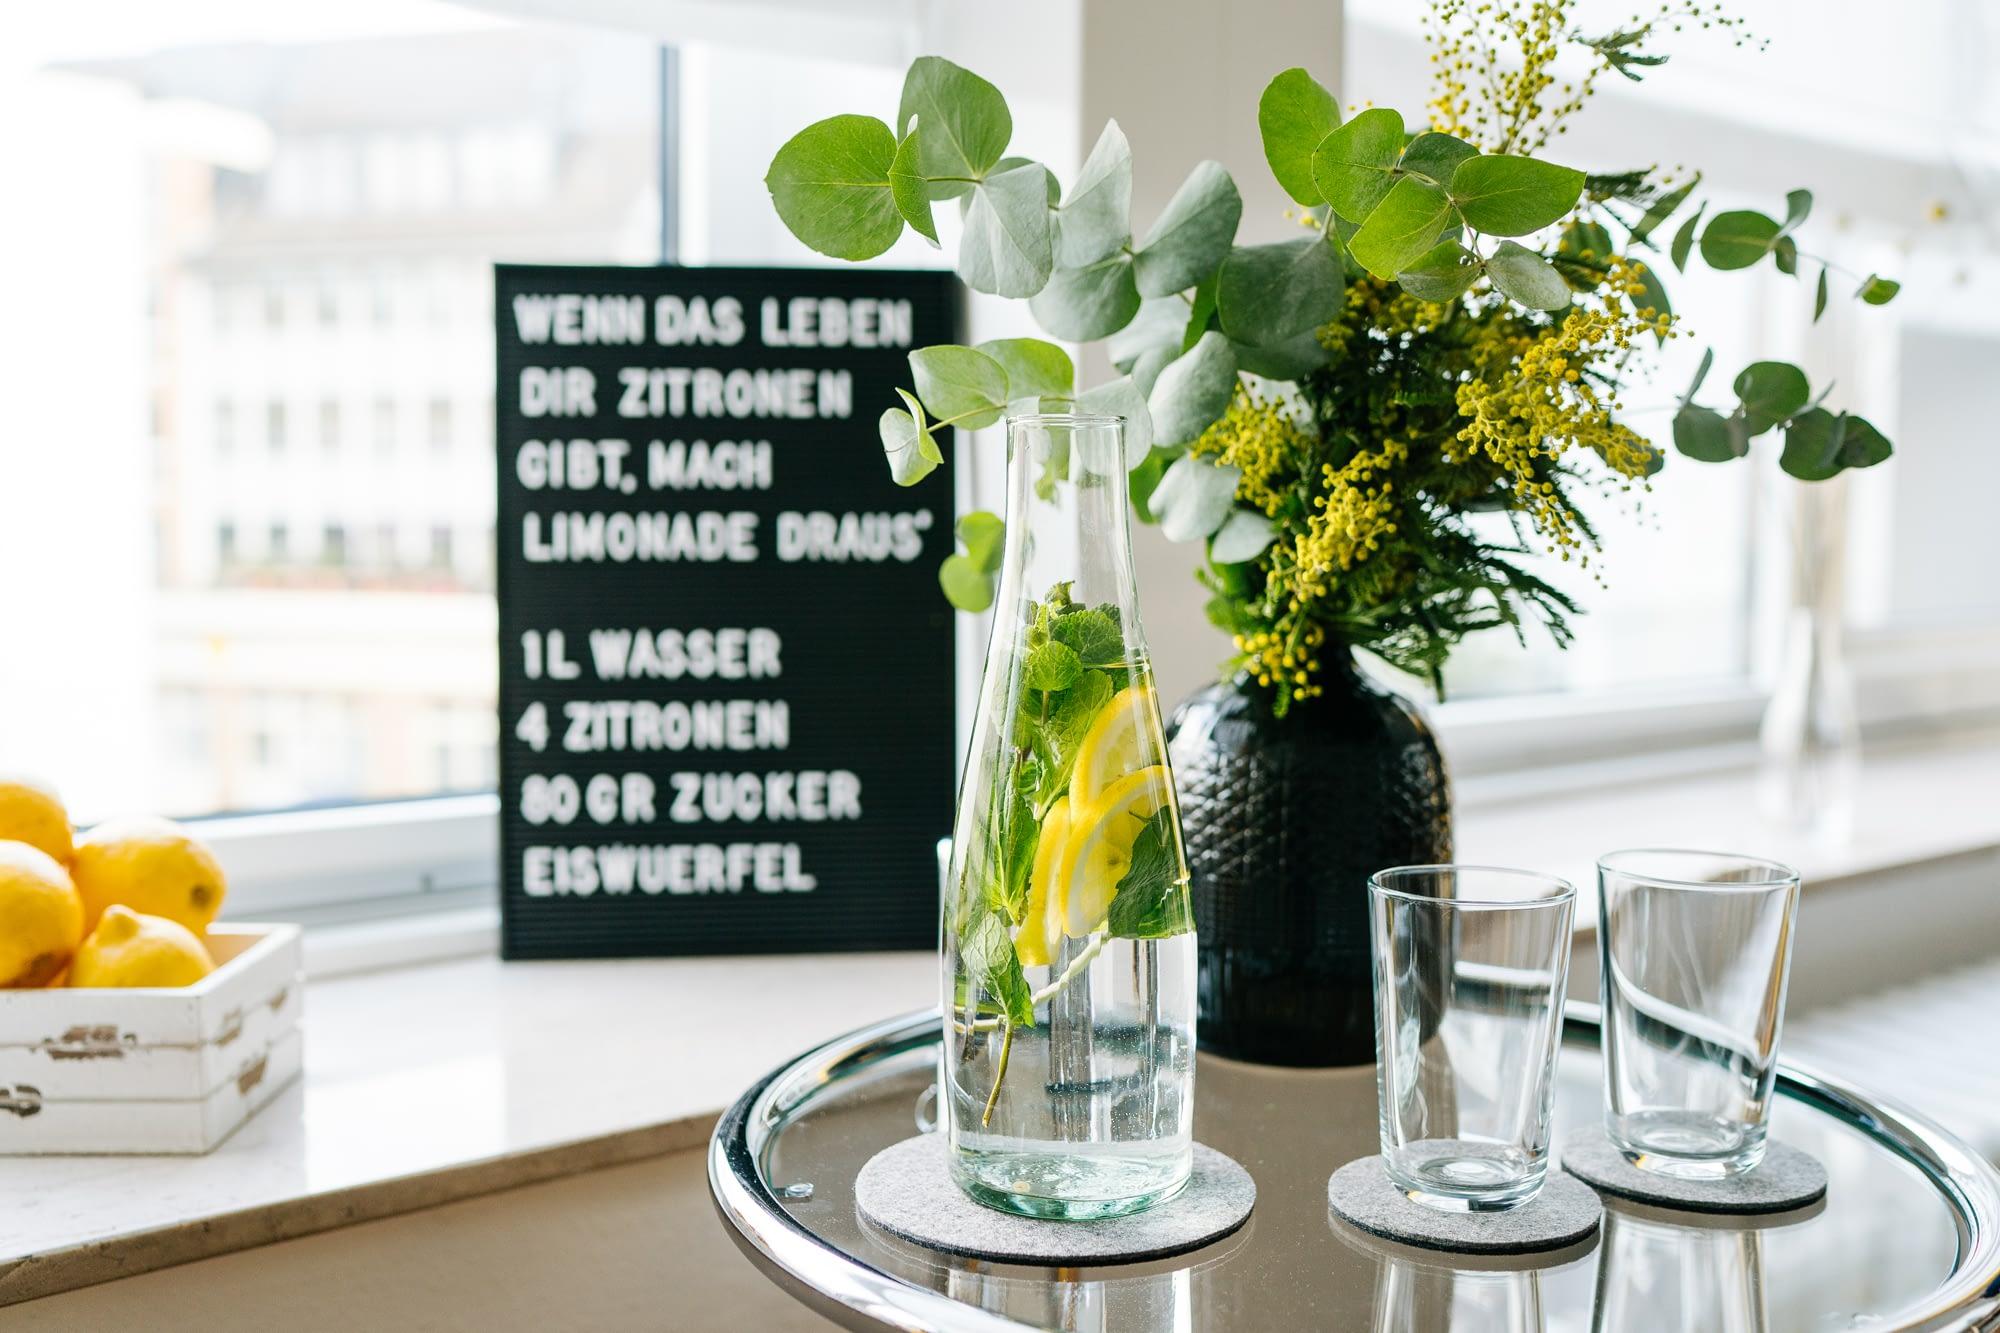 Firmenportrait Düsseldorf